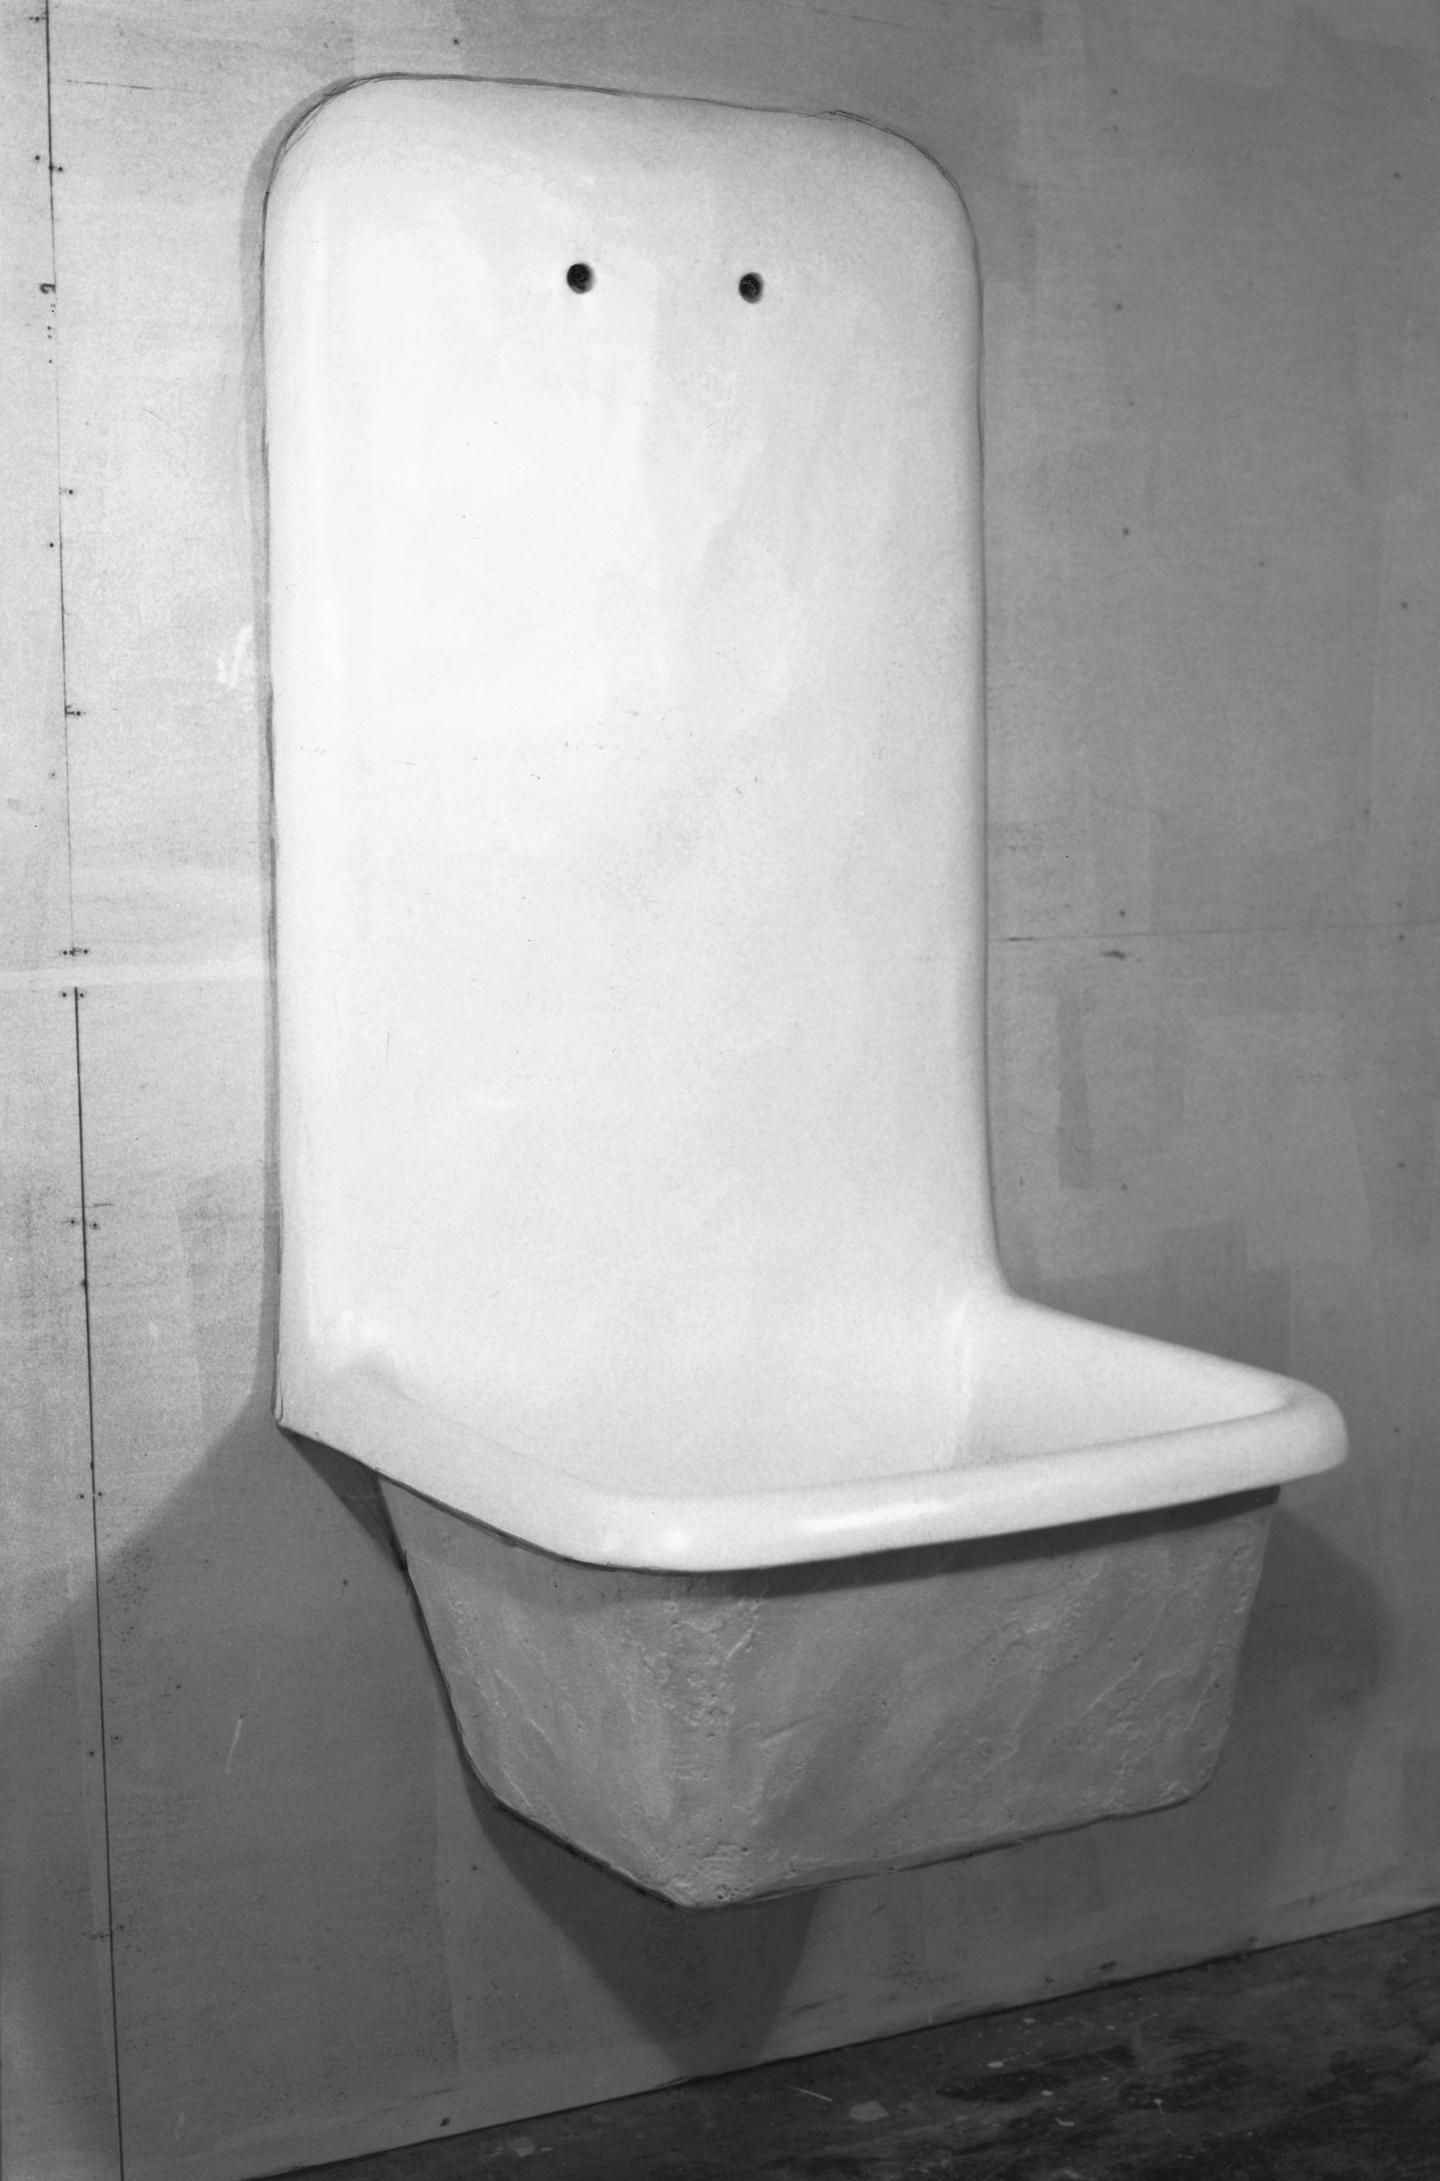 Robert Gober, The Silly Sink, 1985, plaster, wood, steel, wire lath, semi-gloss enamel paint, 160 × 84 × 74 cm. Courtesy: © Robert Gober and Matthew Marks Gallery; photograph: John D. Kramer